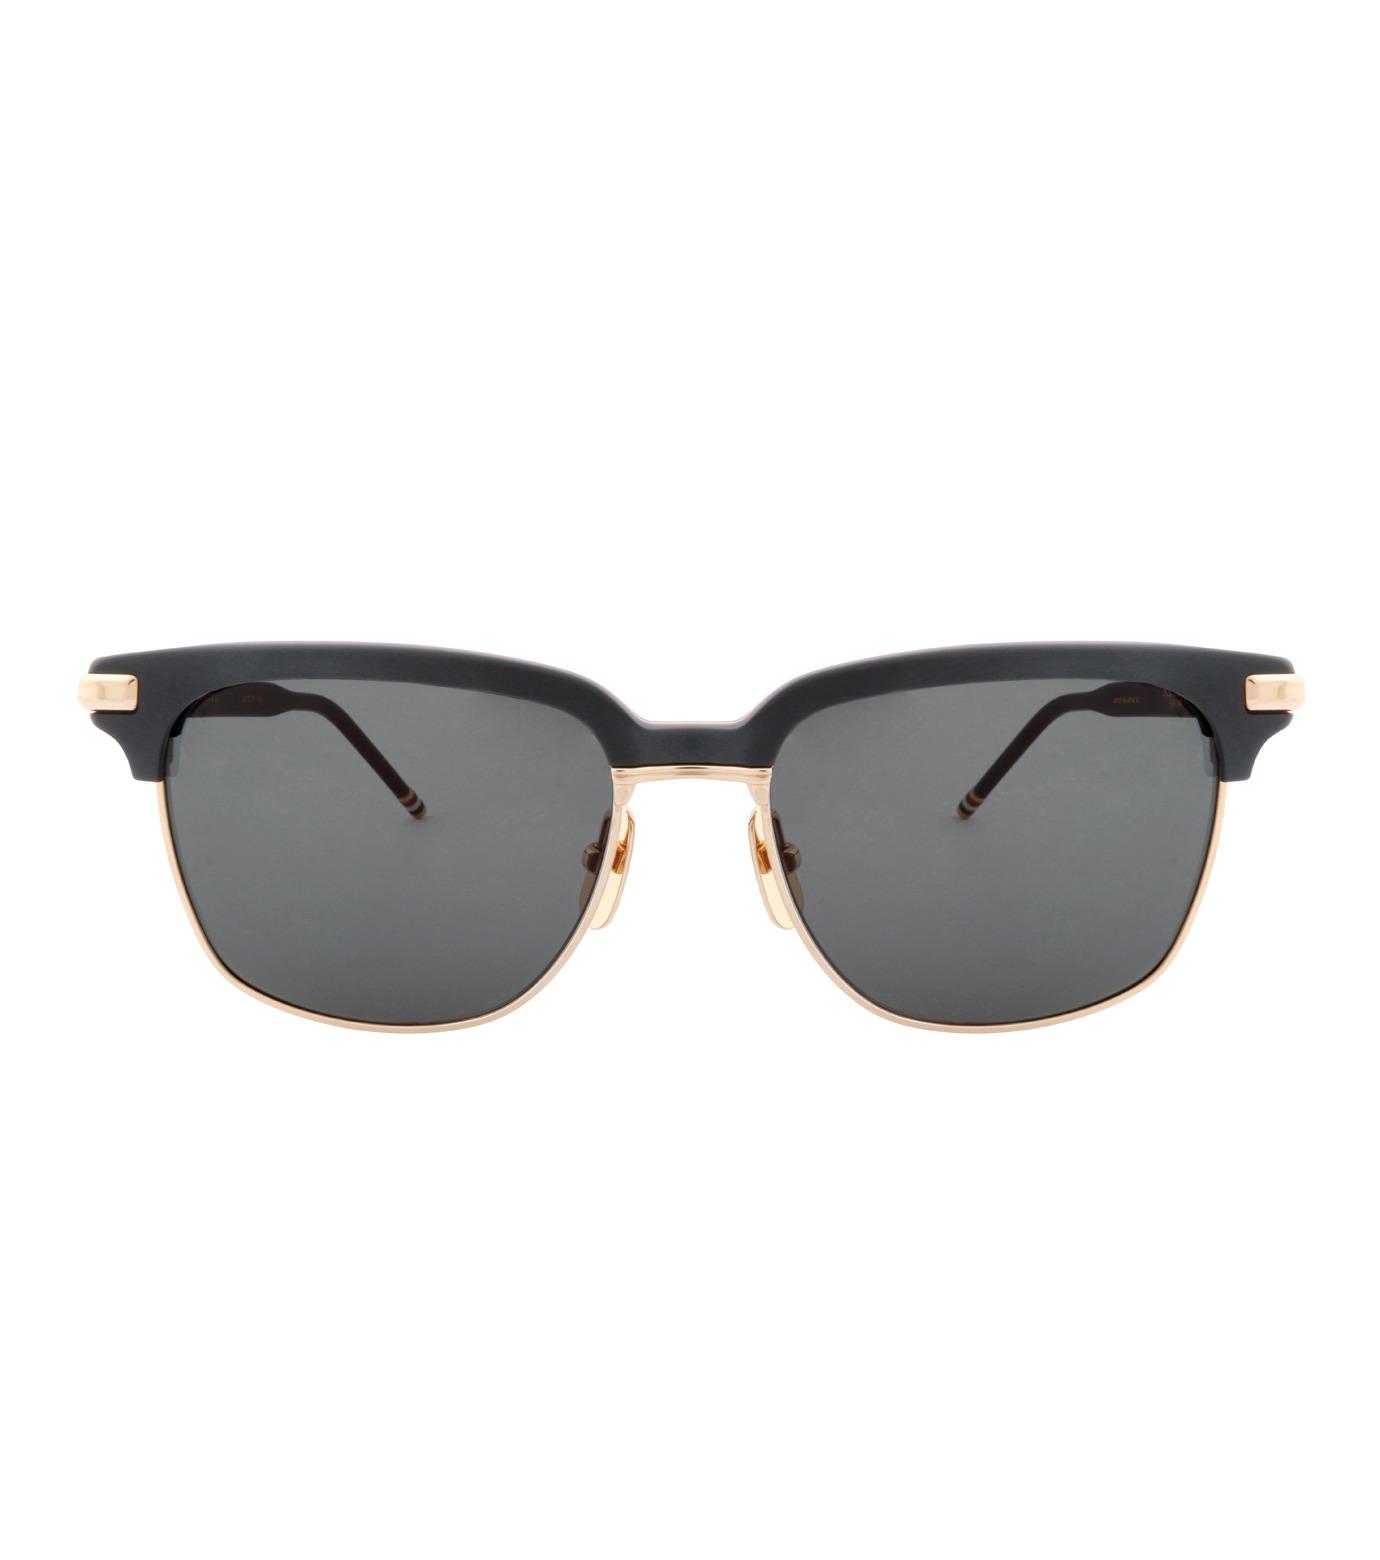 Thom Browne Eye Wear(トム・ブラウン・アイウェア)のBlack Frame-BLACK(アイウェア/eyewear)-TB-713-A-13 拡大詳細画像3